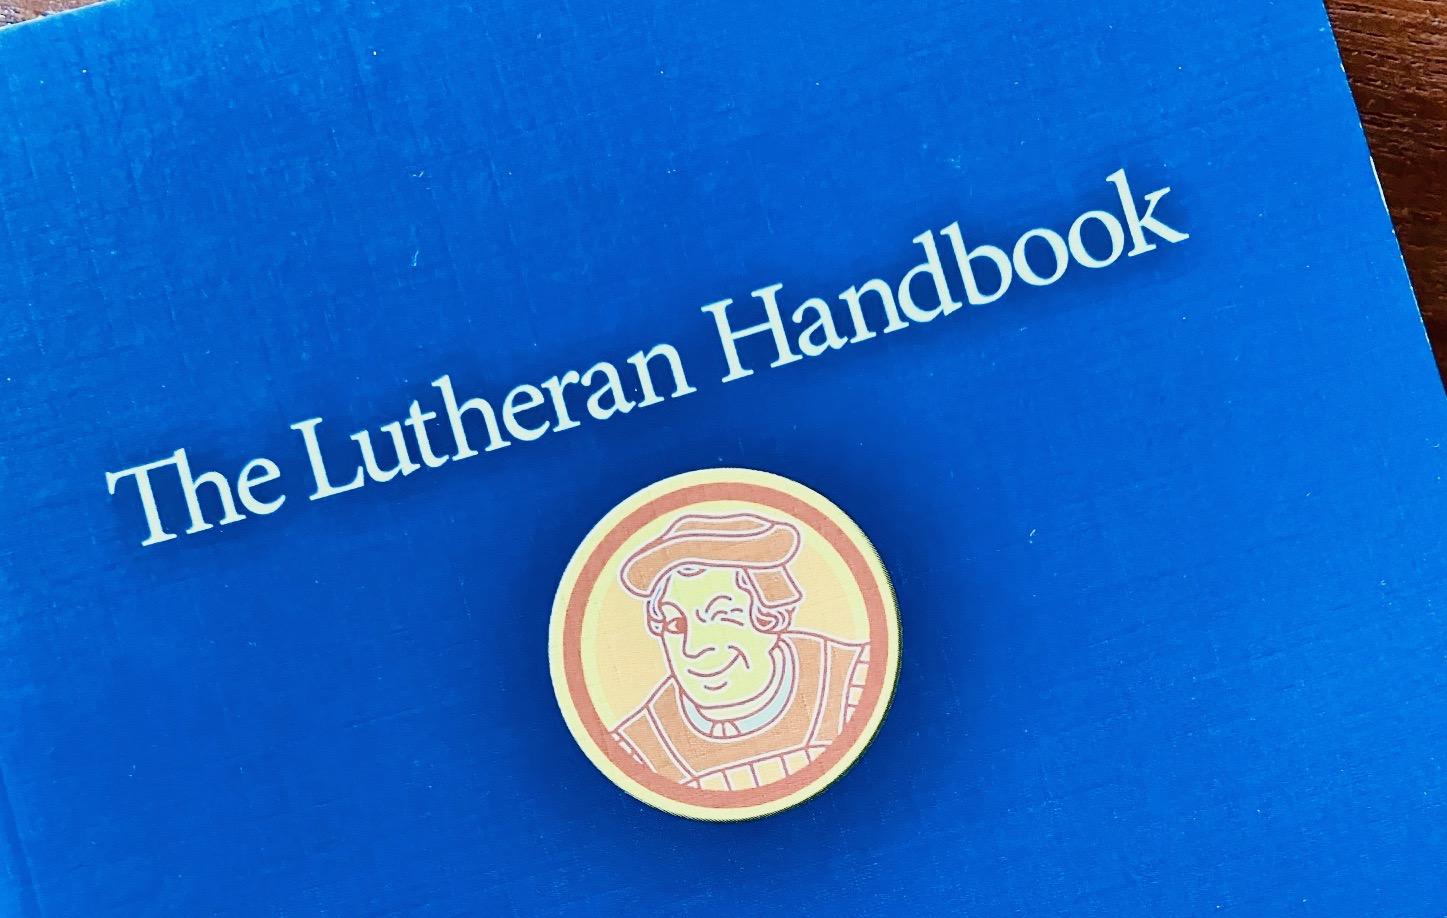 1000 books: Lutheran Handbook.